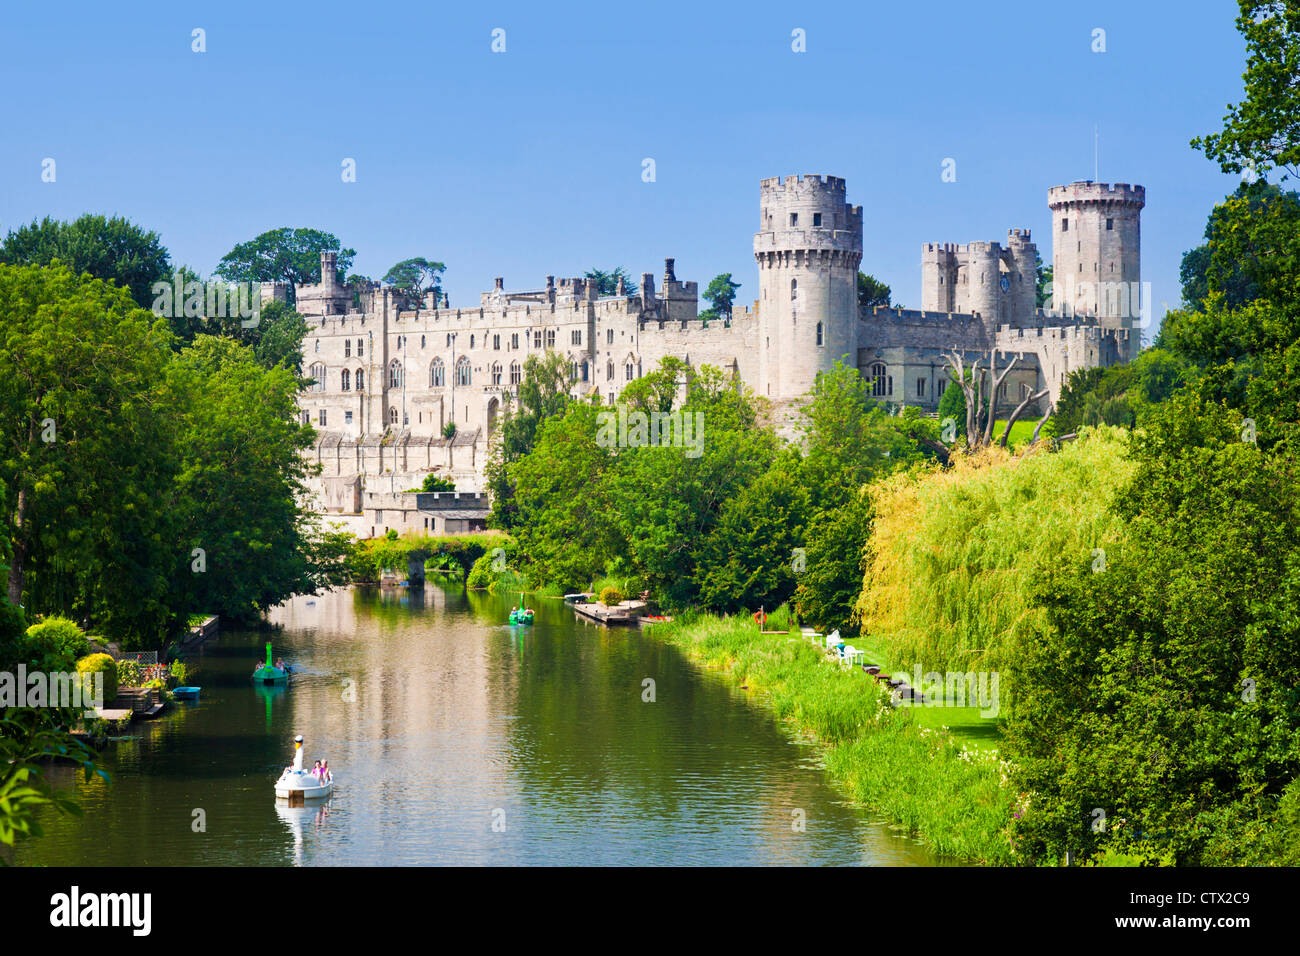 Warwick Castle and River Avon Warwick Warwickshire, England UK GB EU Europe - Stock Image